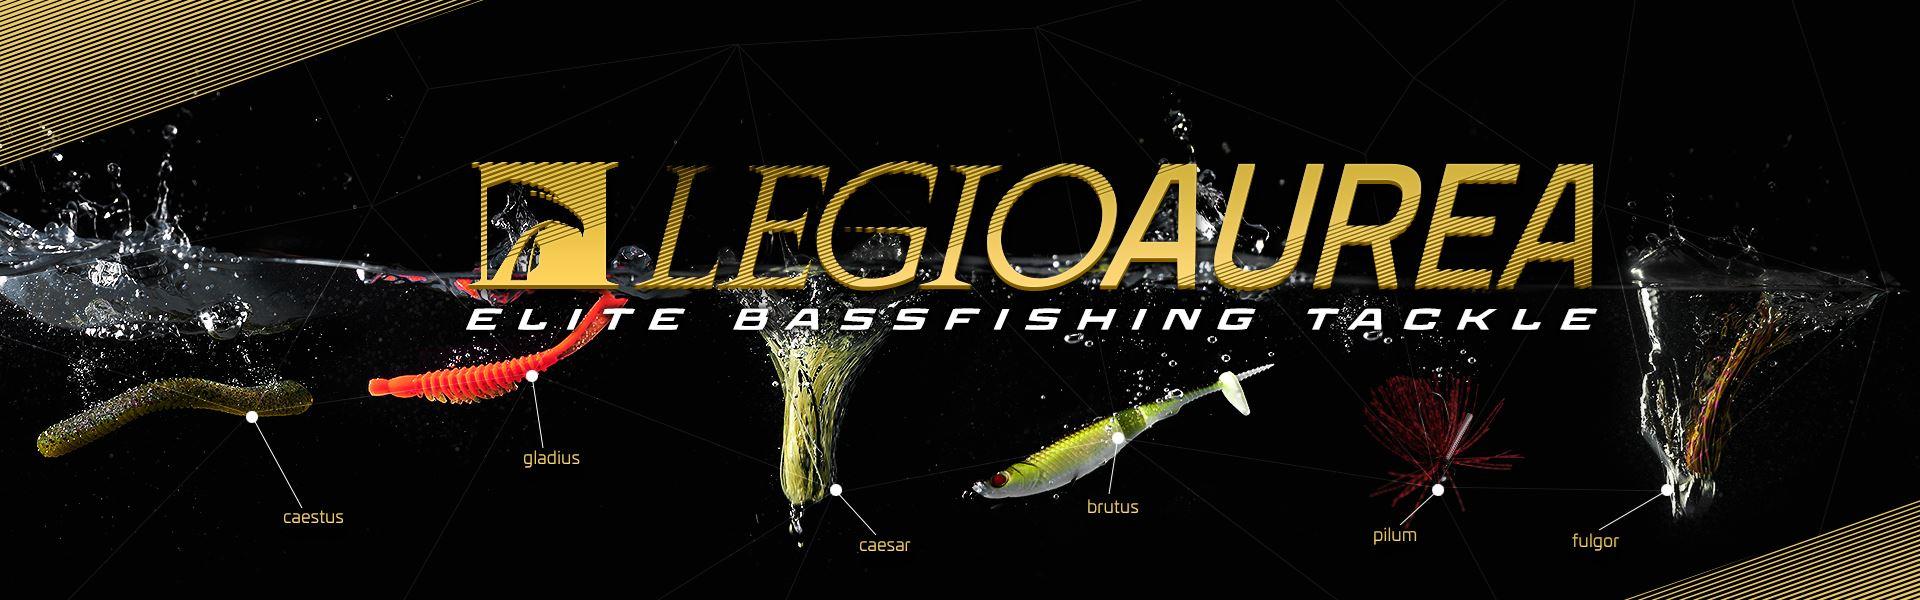 bass fishing, esche da bass, esche da spigola, esche rigide, jerkbait, wtd, popper, esche da trout area, trout game, pesca in mare, spinning in mare, spinning laghetto